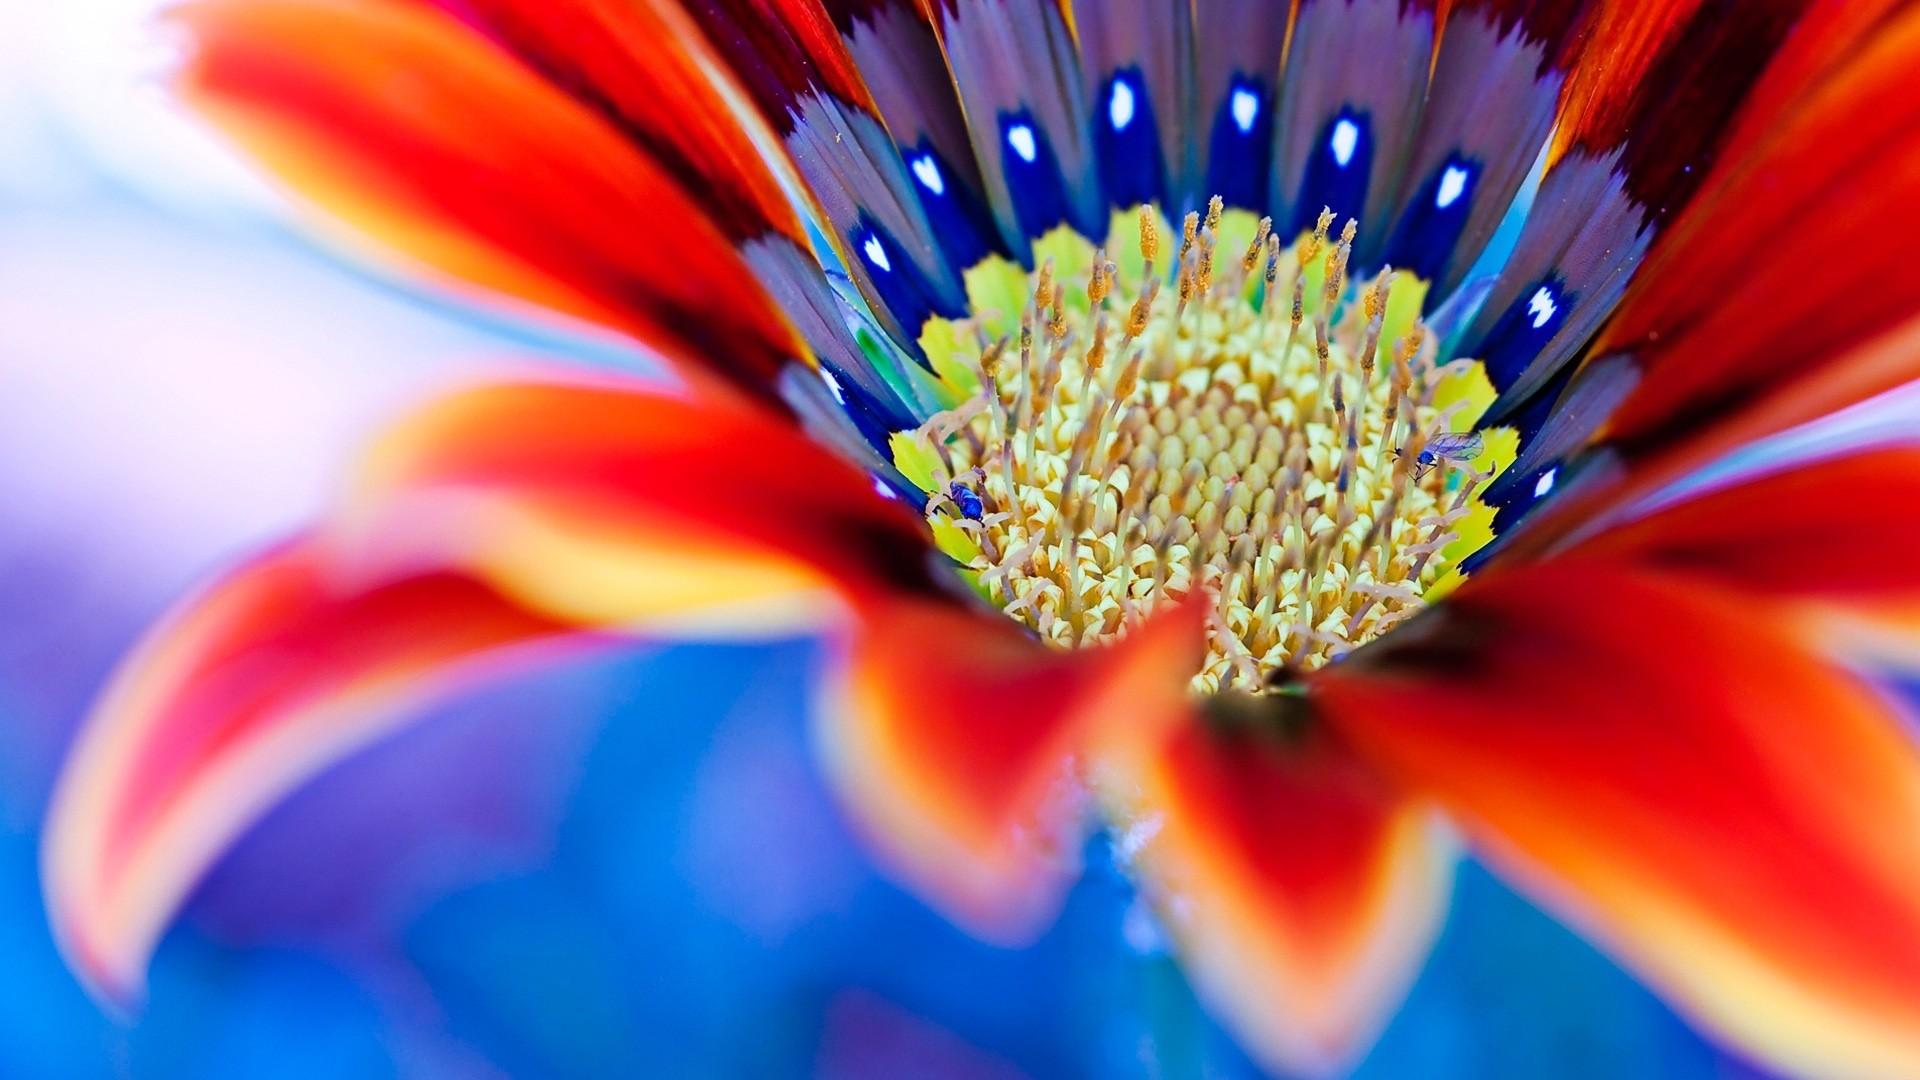 Sfondi full hd desktop fiori 86 immagini for Foto full hd per desktop